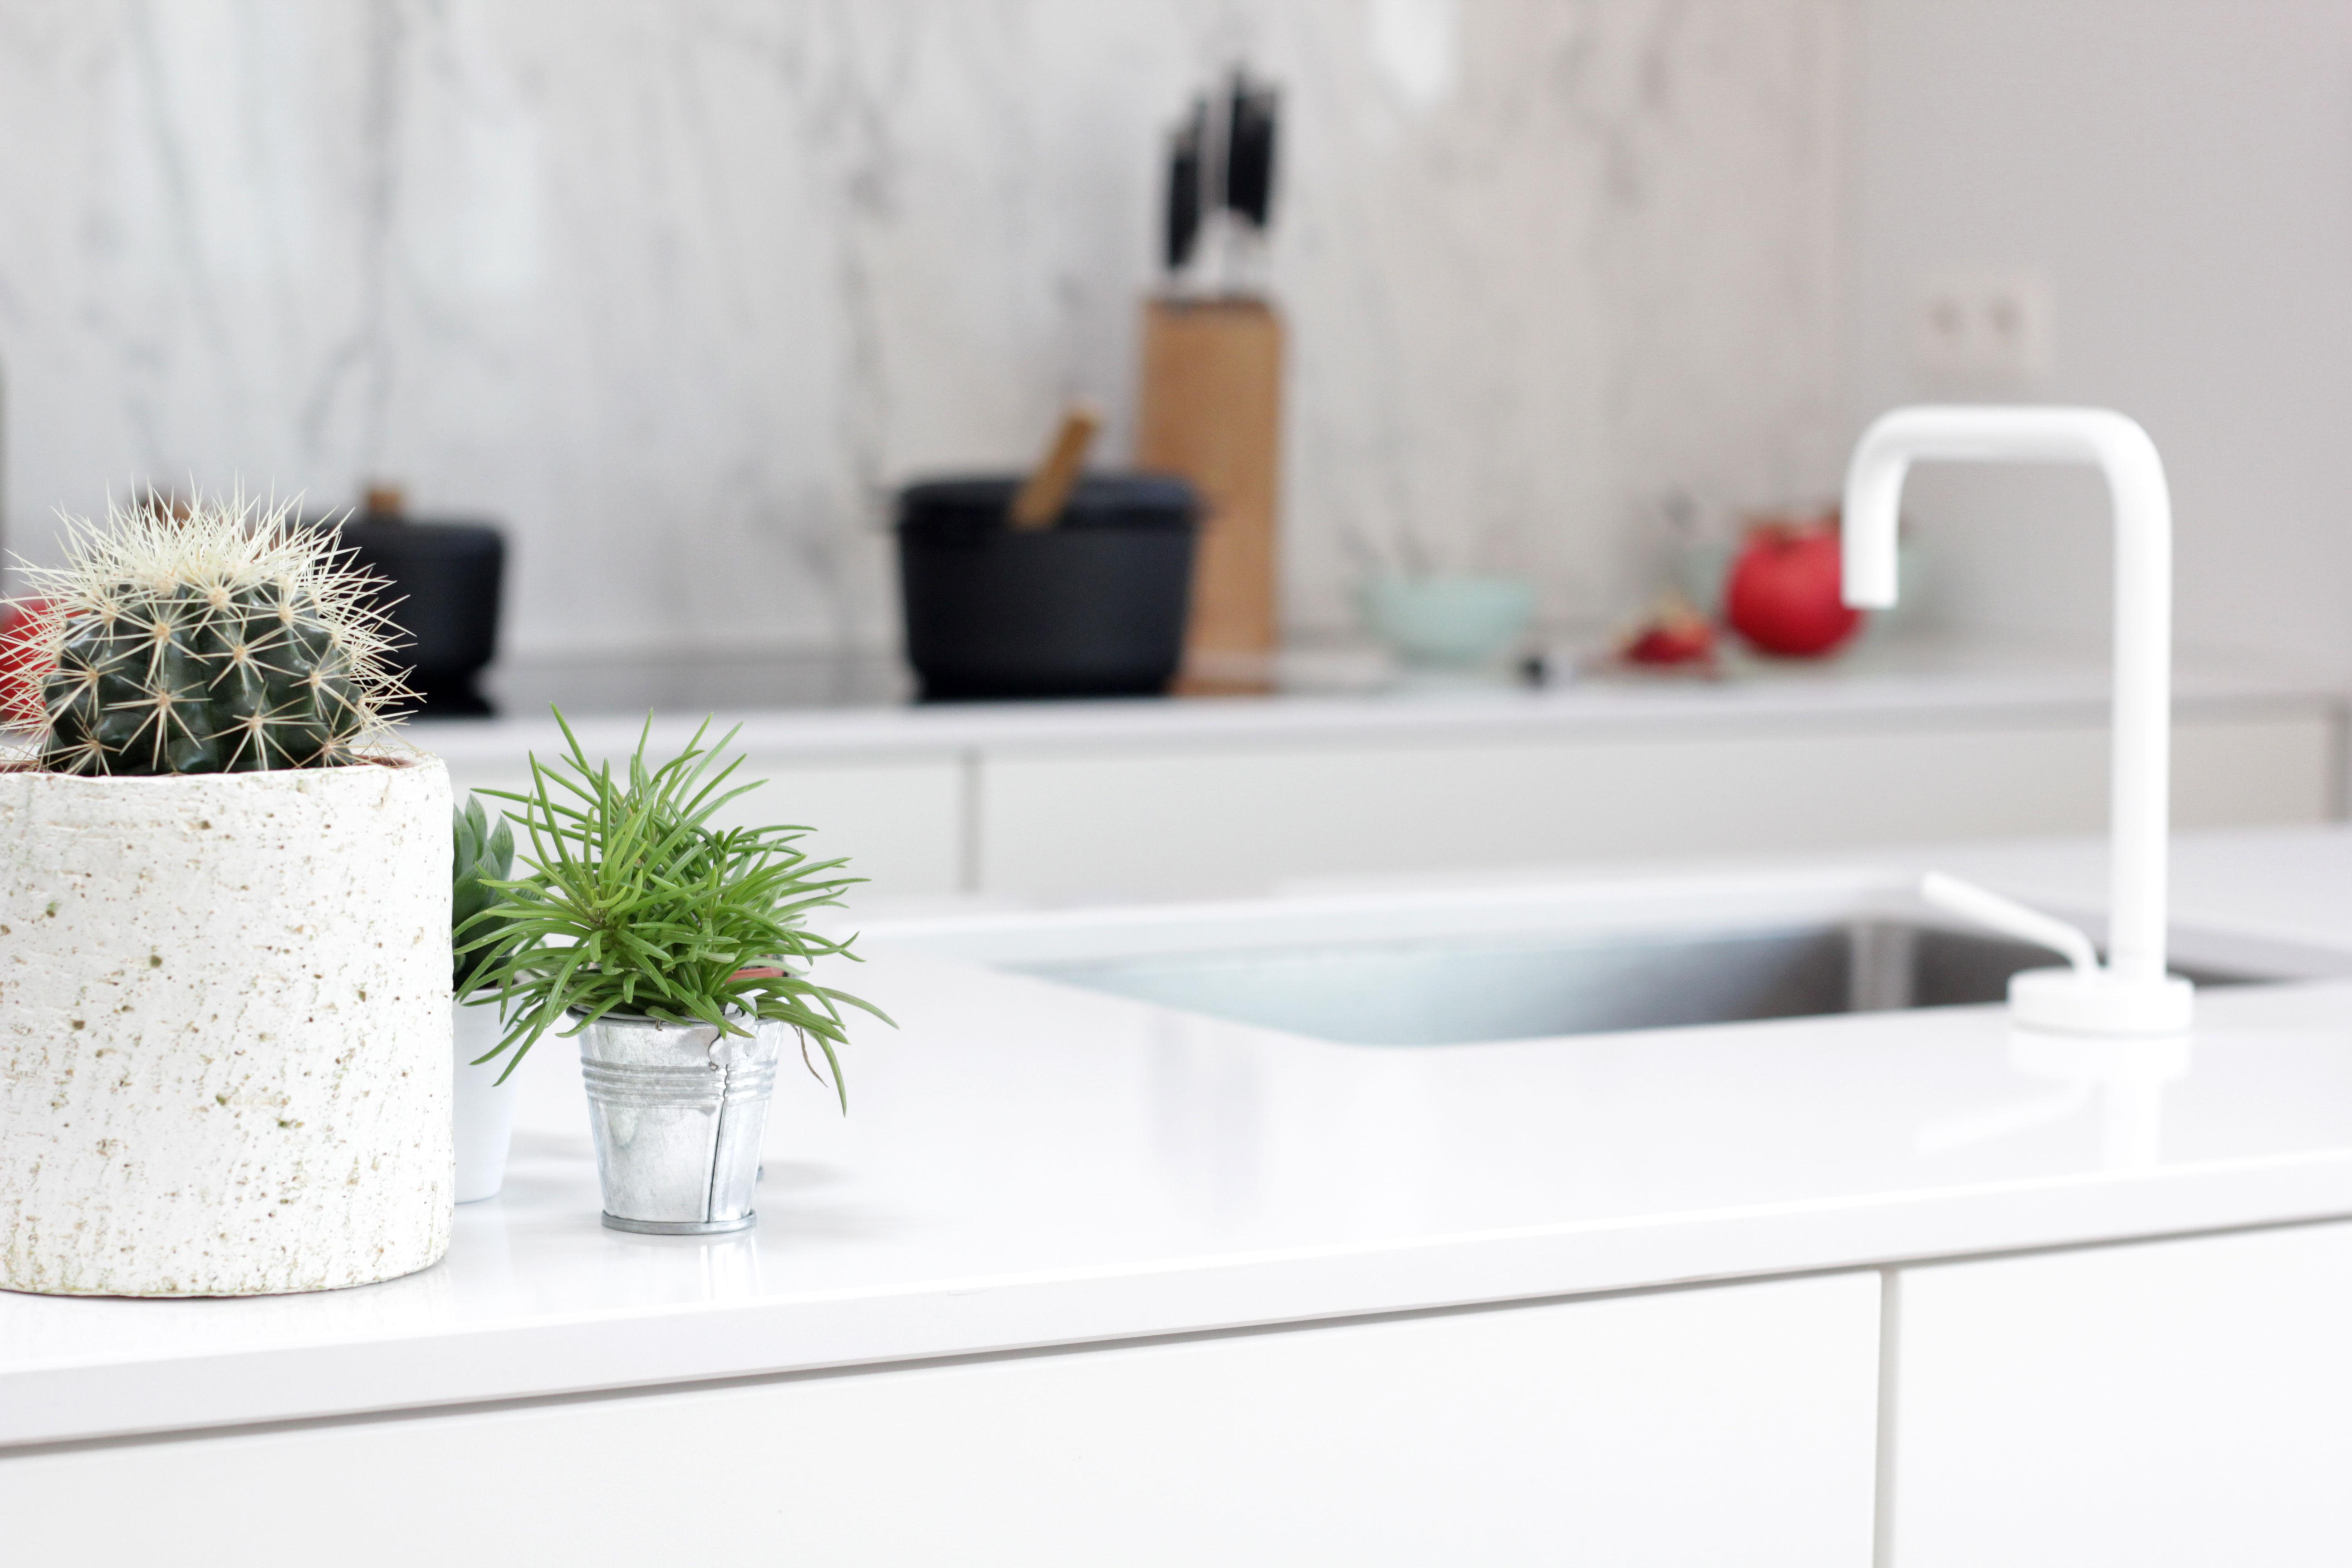 project-home-to-be-keuken-praktisch-wit-marmer-hout-bucket-list-lovelifelovefashion-2